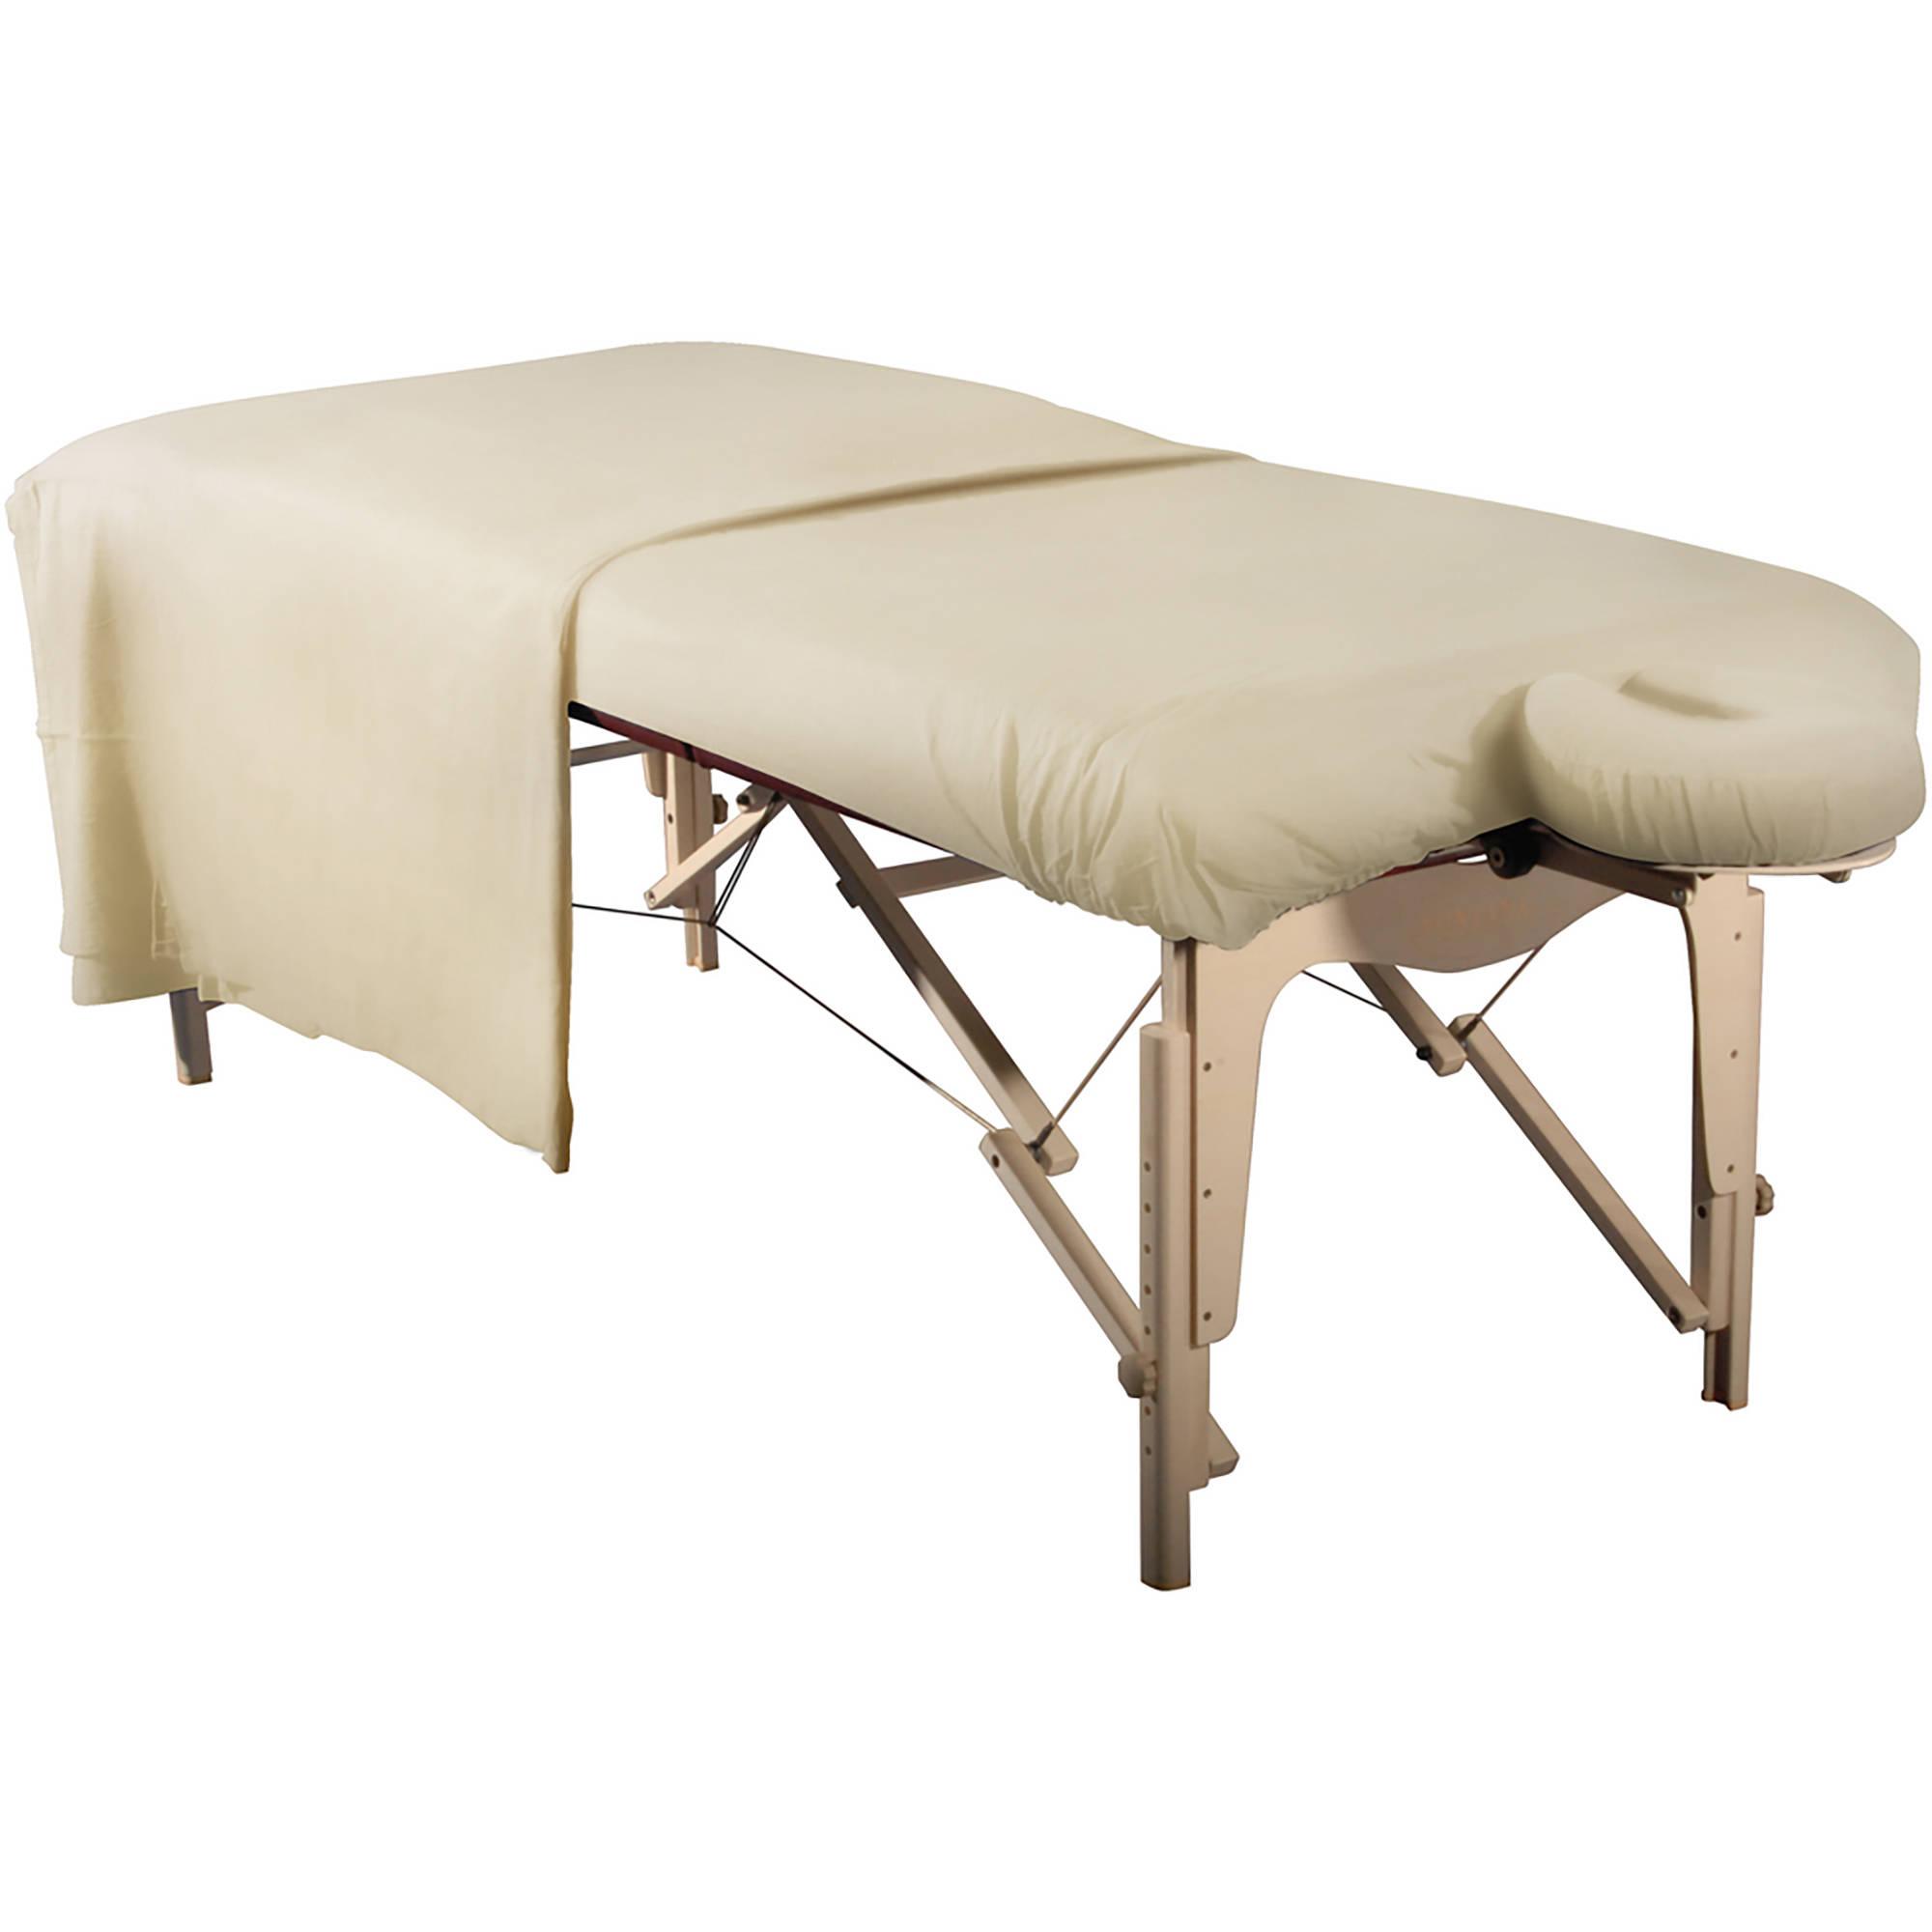 MT Massage Deluxe 3-in-1 Flannel Sheet Set